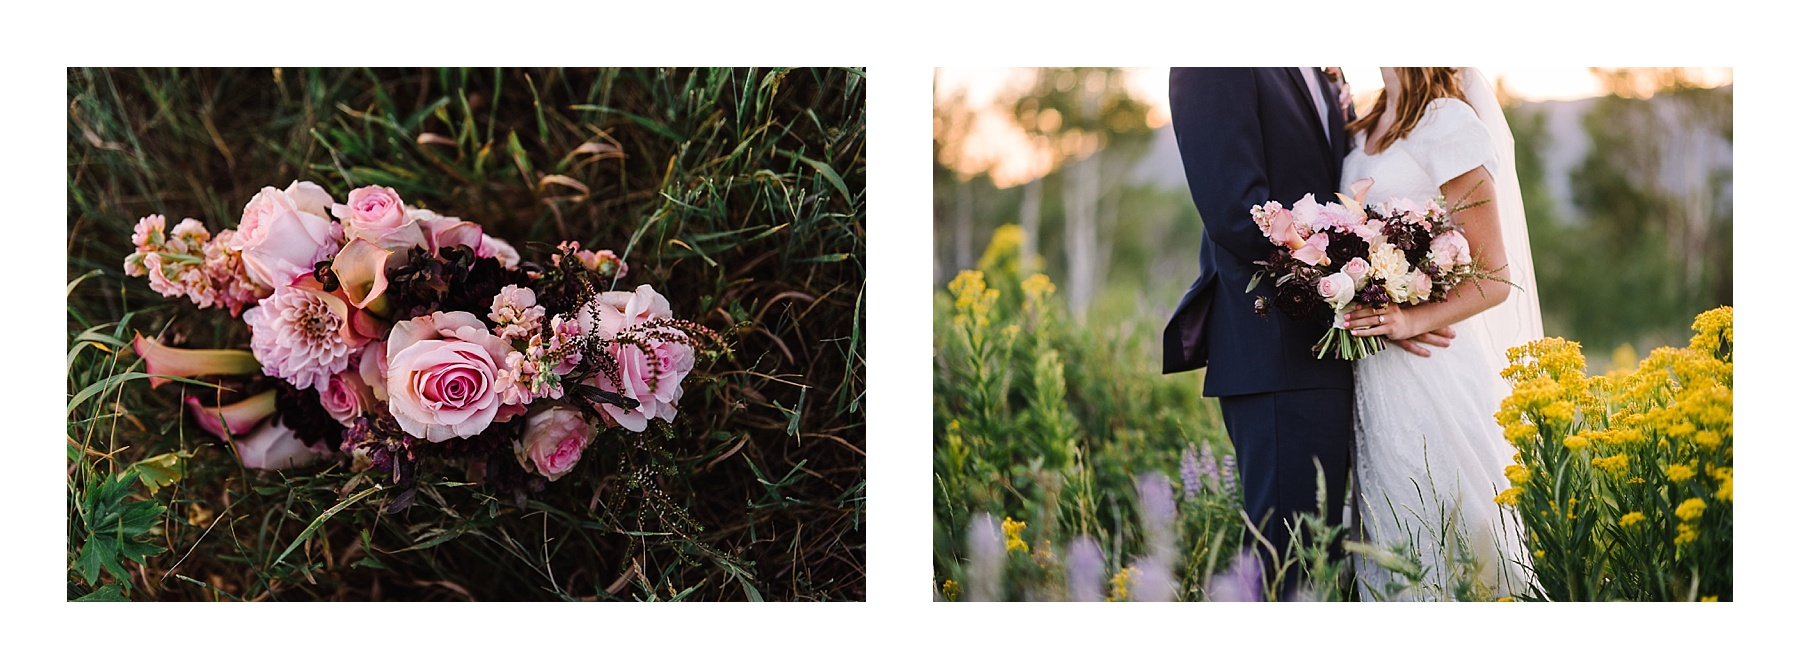 blush-burgandy-bouquet_0642.jpg